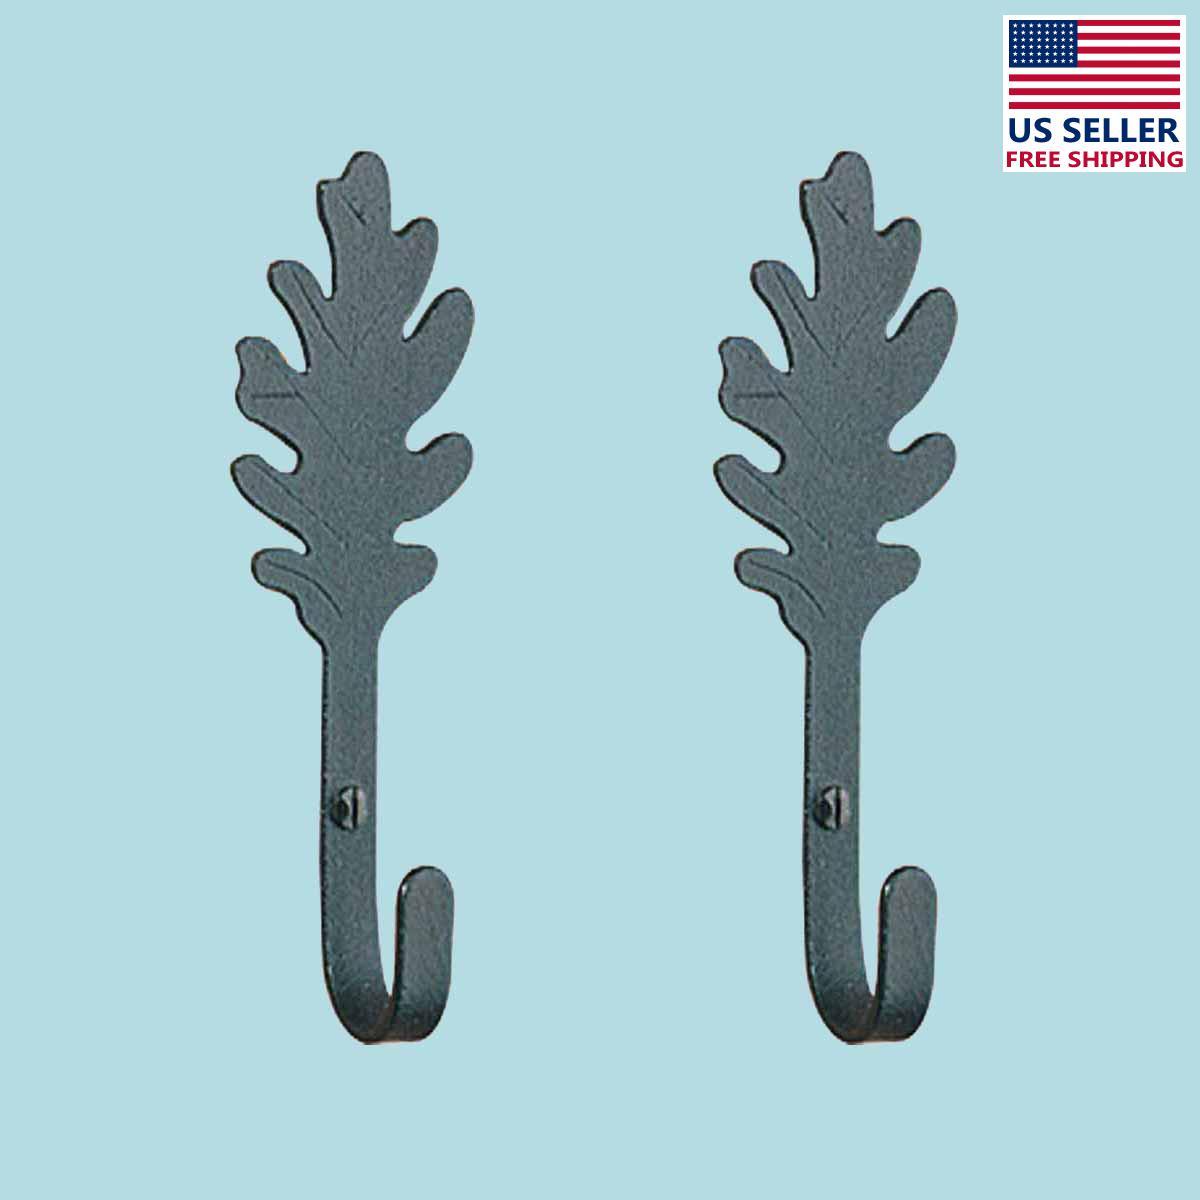 2 Kitchen Hook Wrought Iron Leaf Shape Black  | Renovators Supply 2